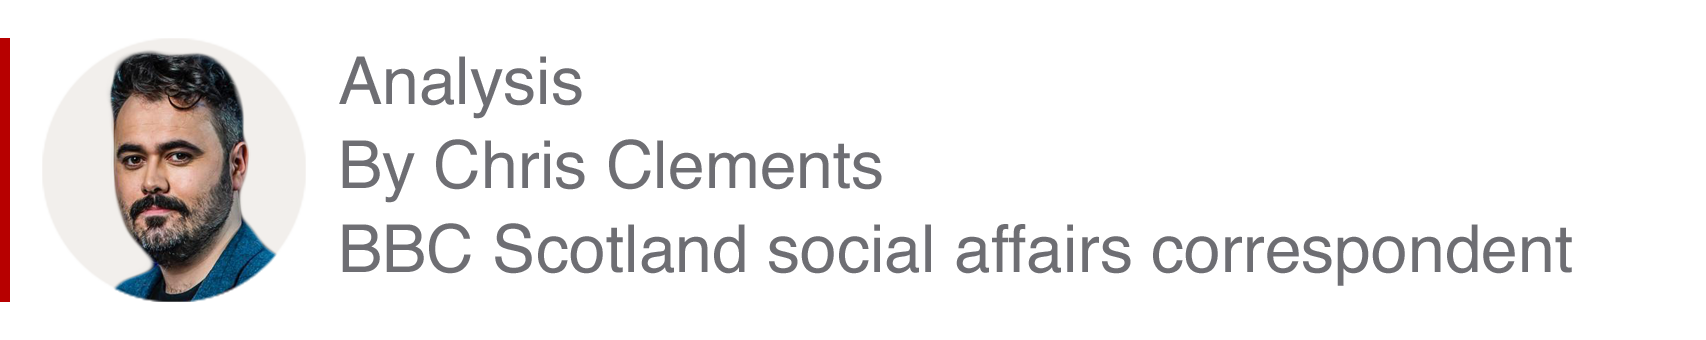 Analysis box by Chris Clements, BBC Scotland social affairs correspondent